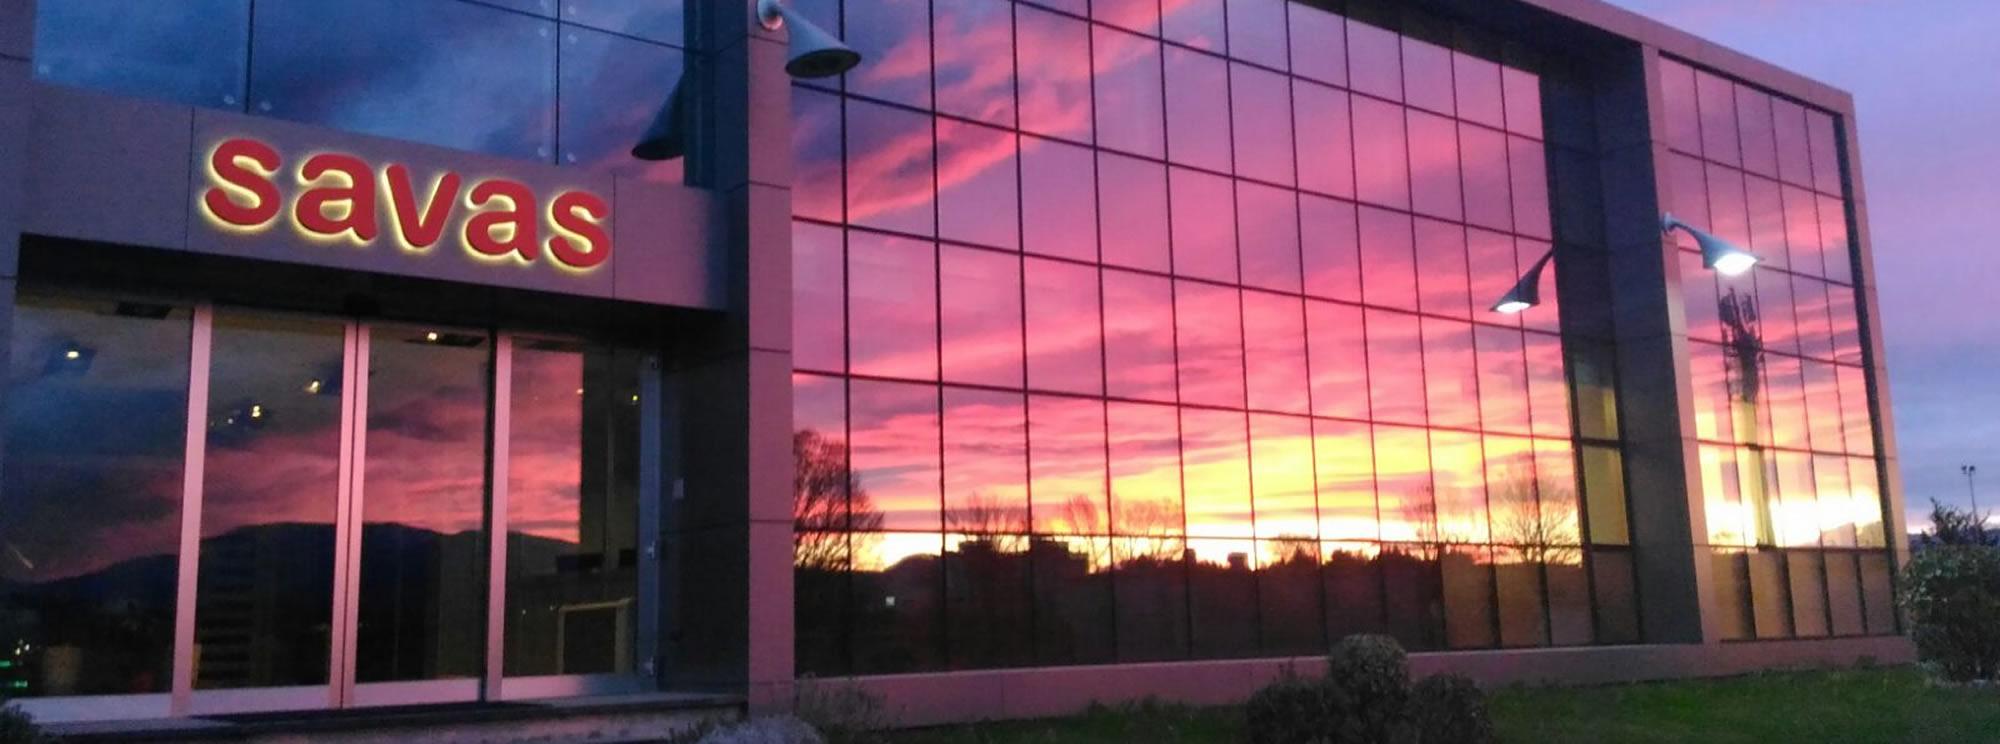 Savas Spa - distributore nazionale vetri Pujol